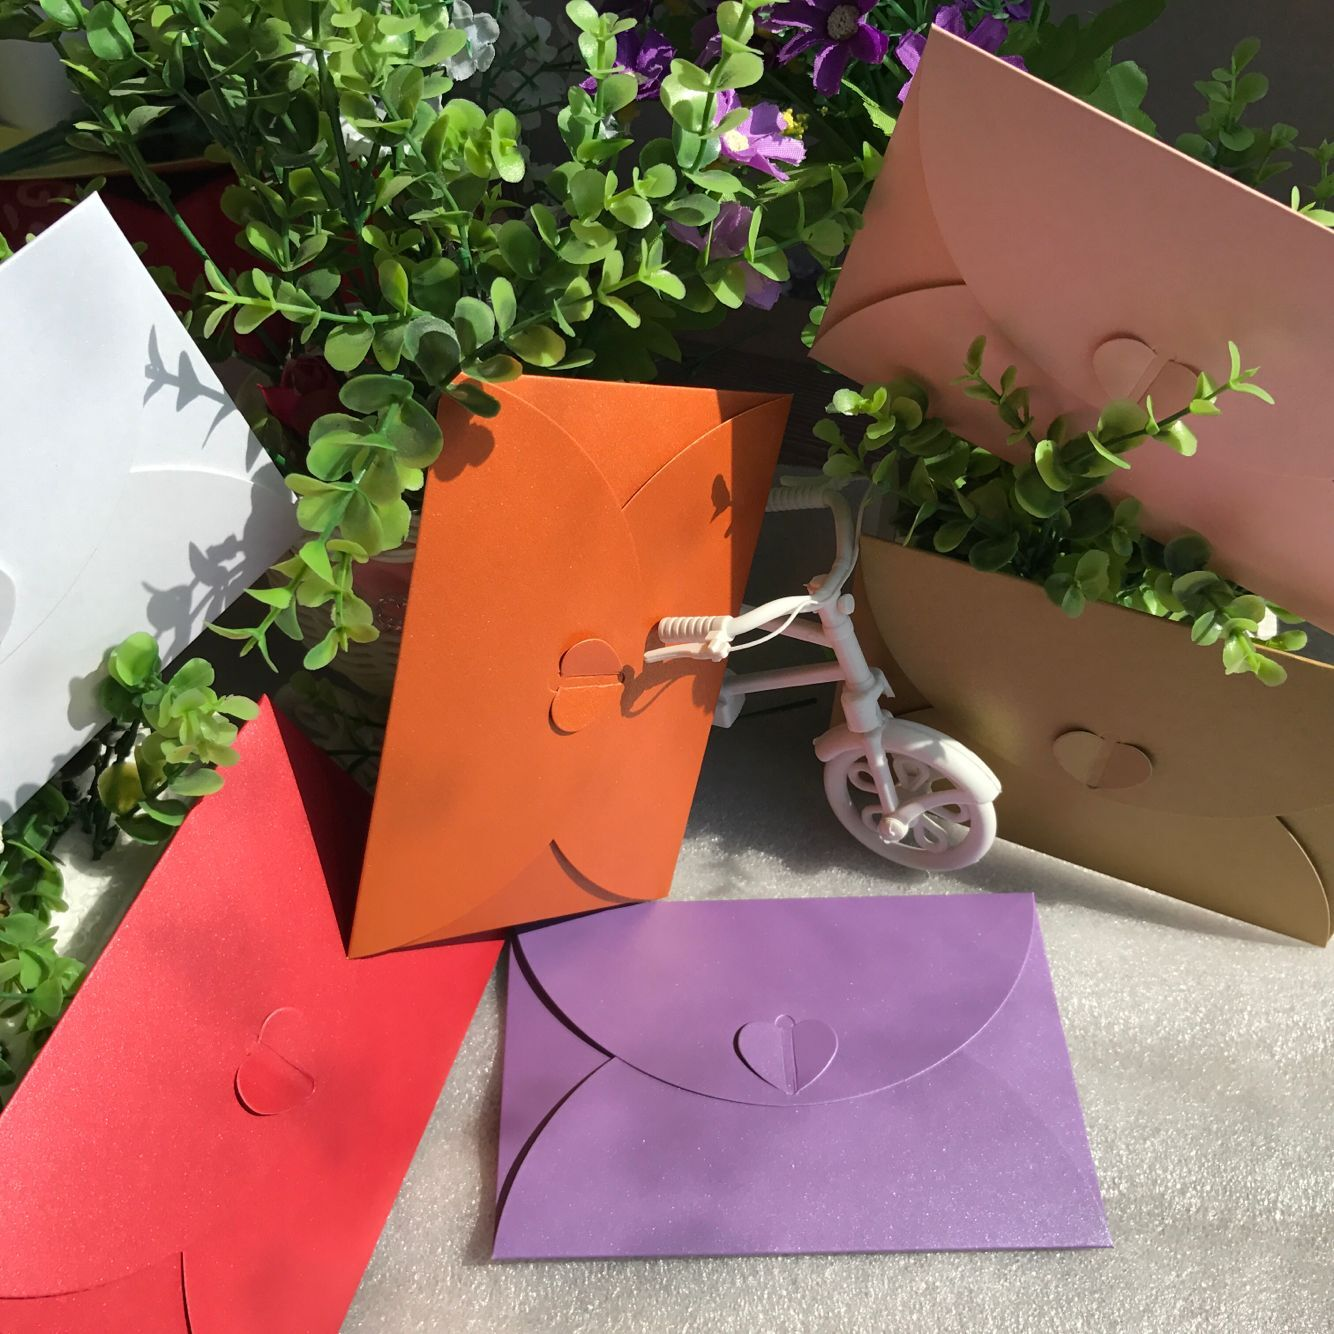 M G 50pcs set envelopes for invitations weeding envelope 17 5 11cm 1inch 2 54cm paper envelopes wedding invitation envelope in Paper Envelopes from Office School Supplies